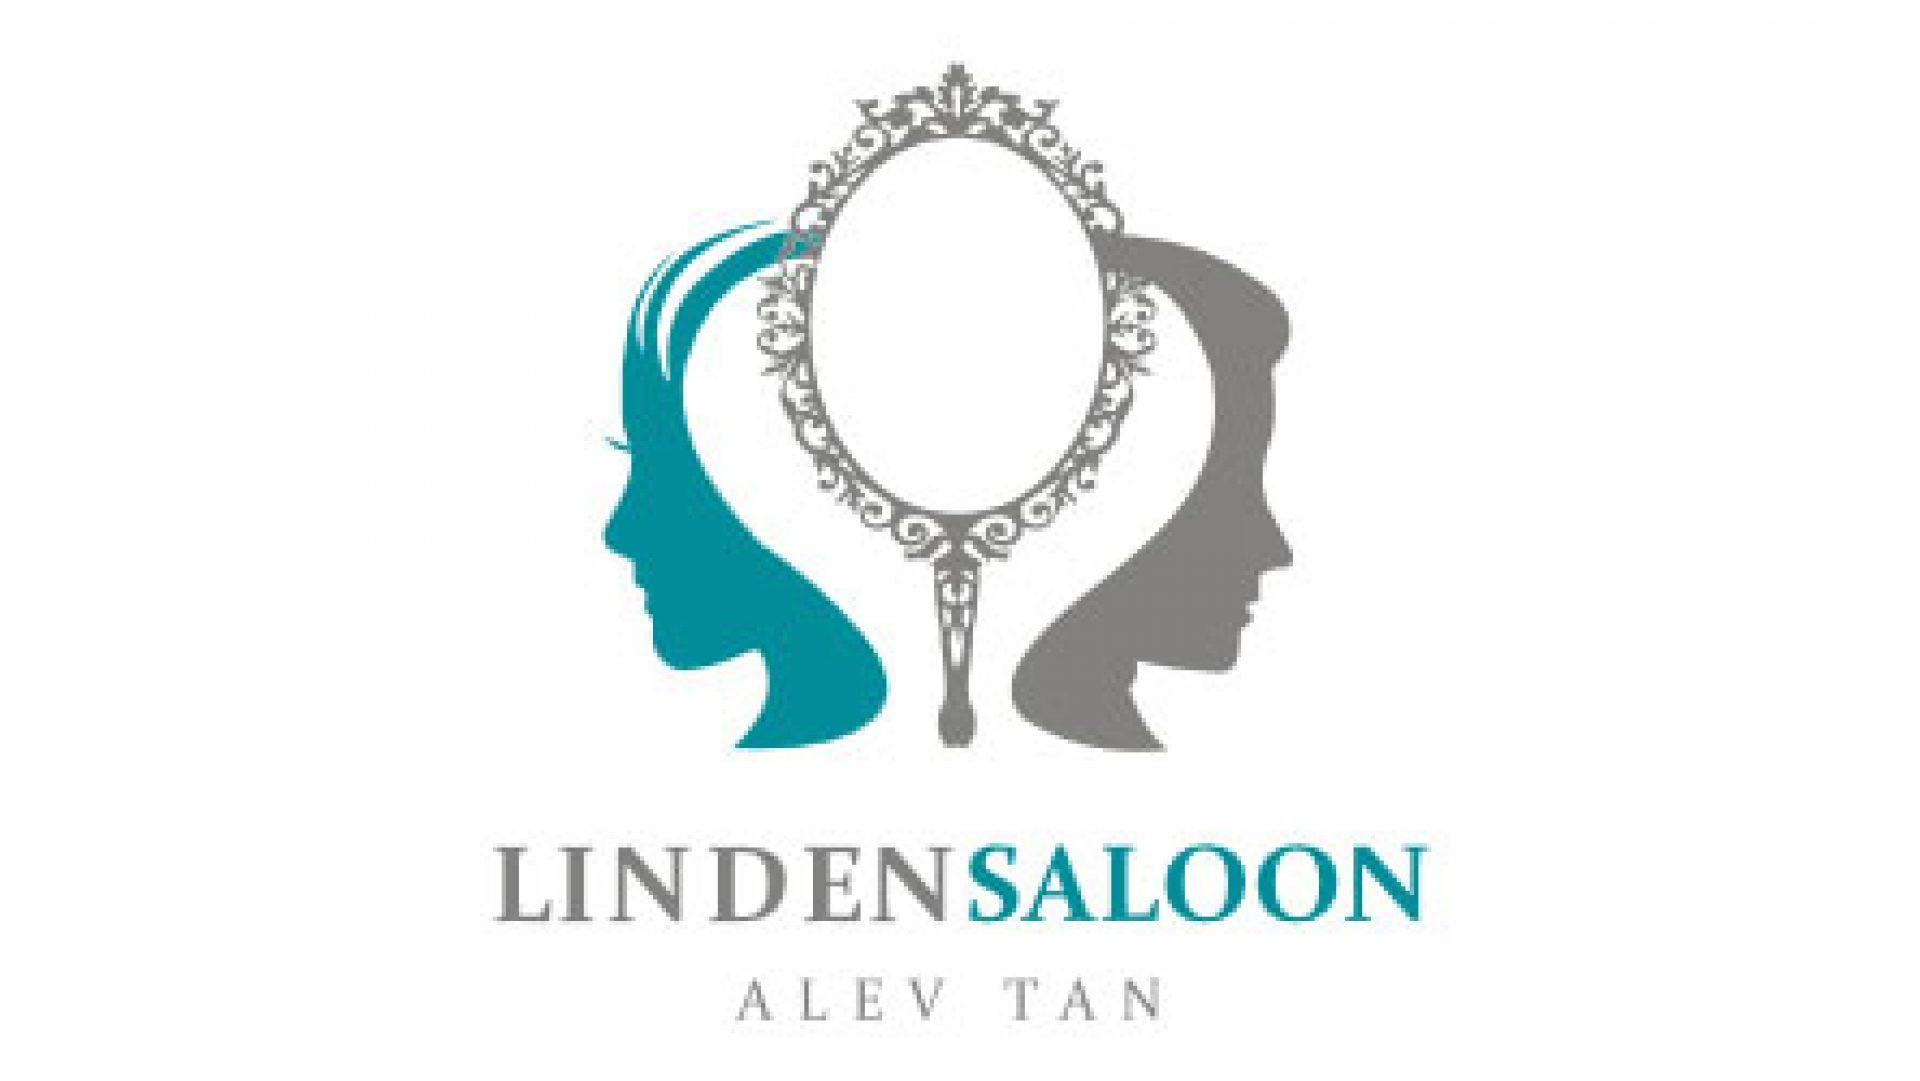 Lindensaloon